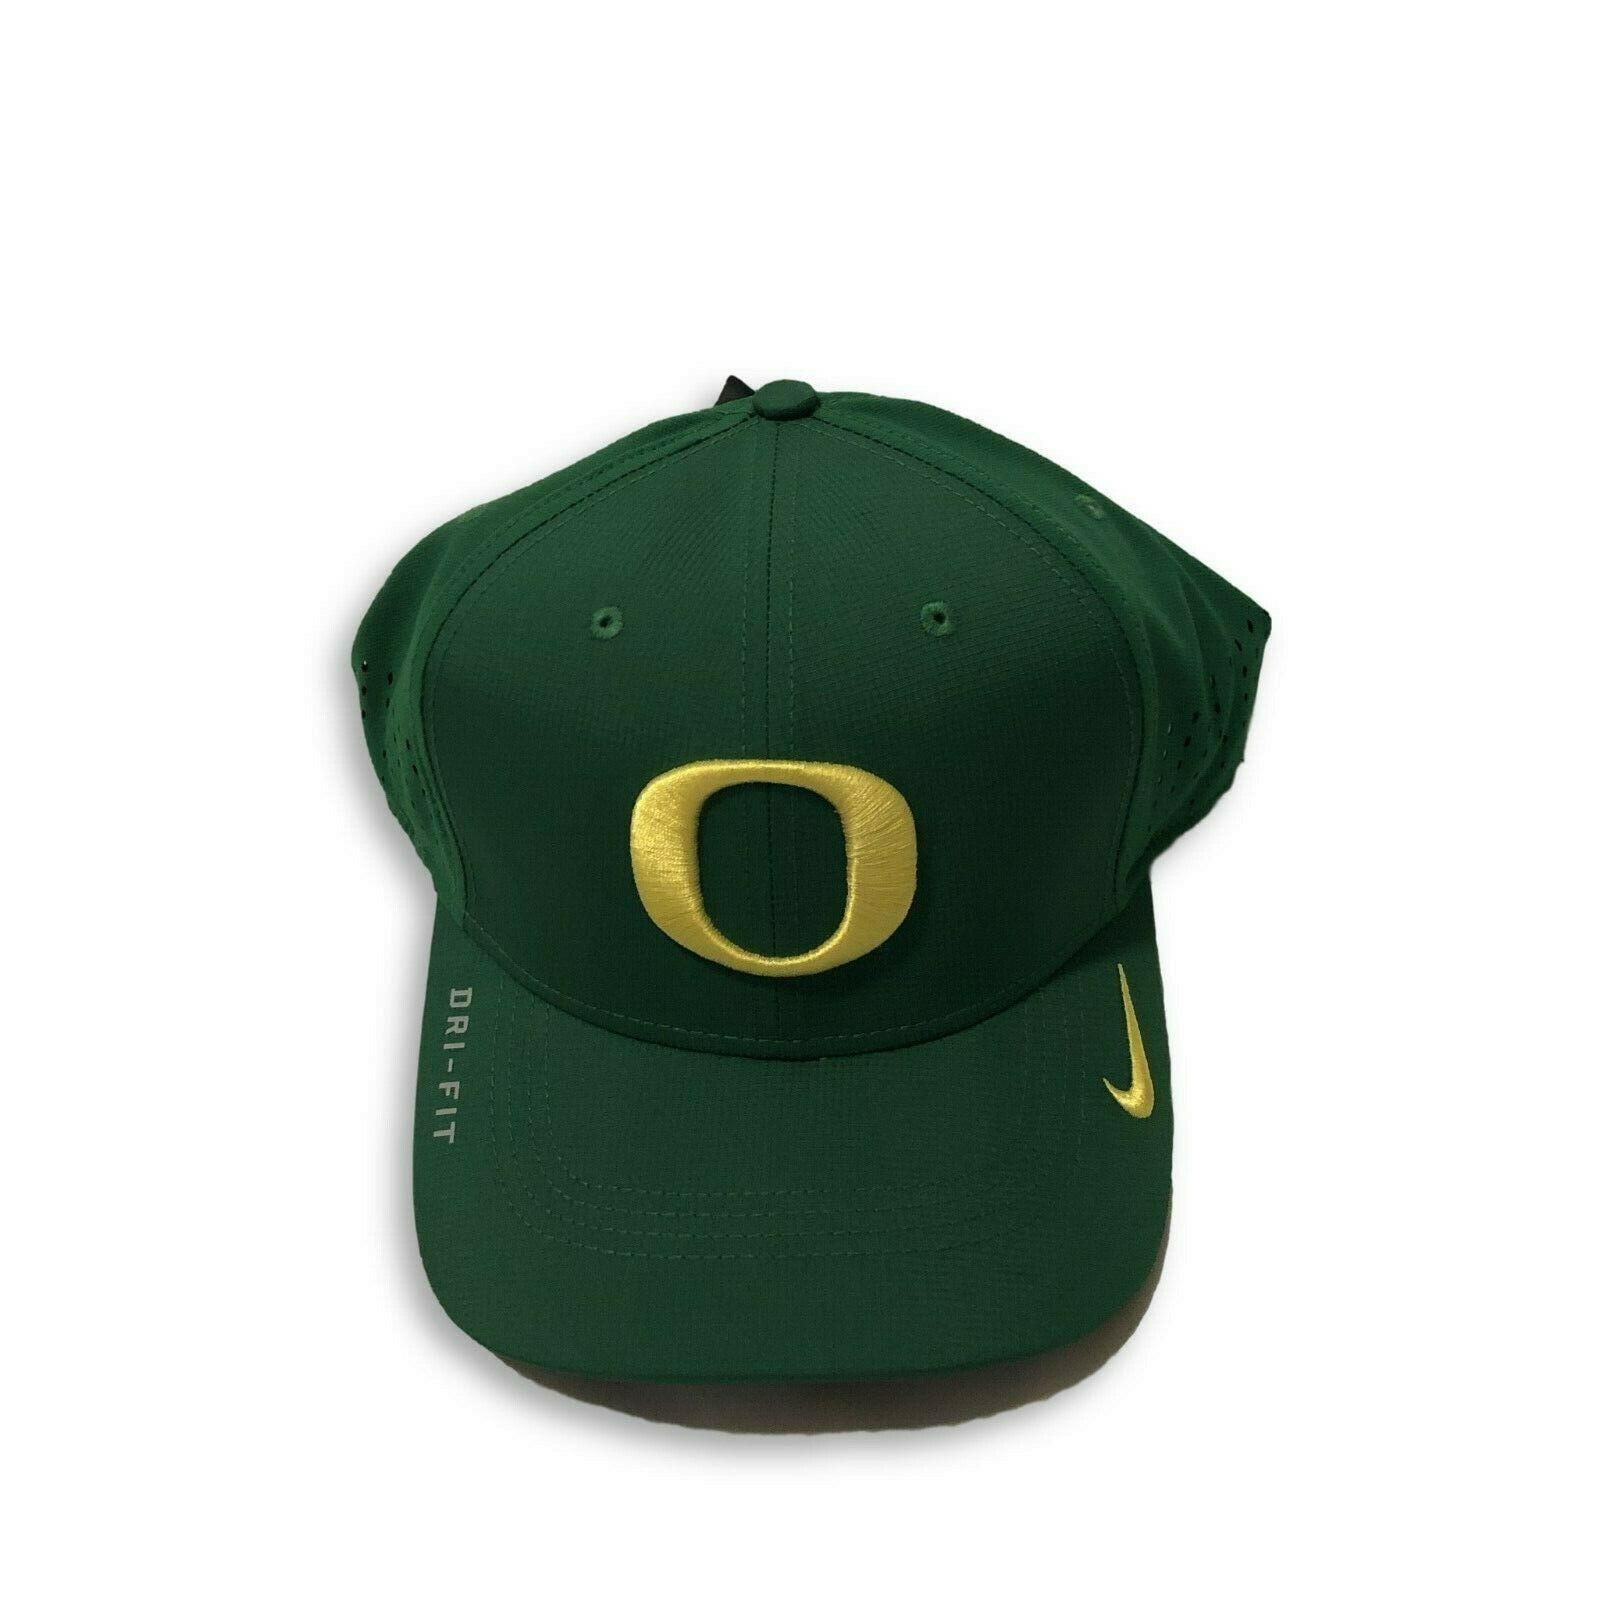 huge discount e0de4 91bc4 NWT New Oregon Ducks Nike Dri-Fit Vapor Sideline Apple Green Flex-Fit Hat -   27.67